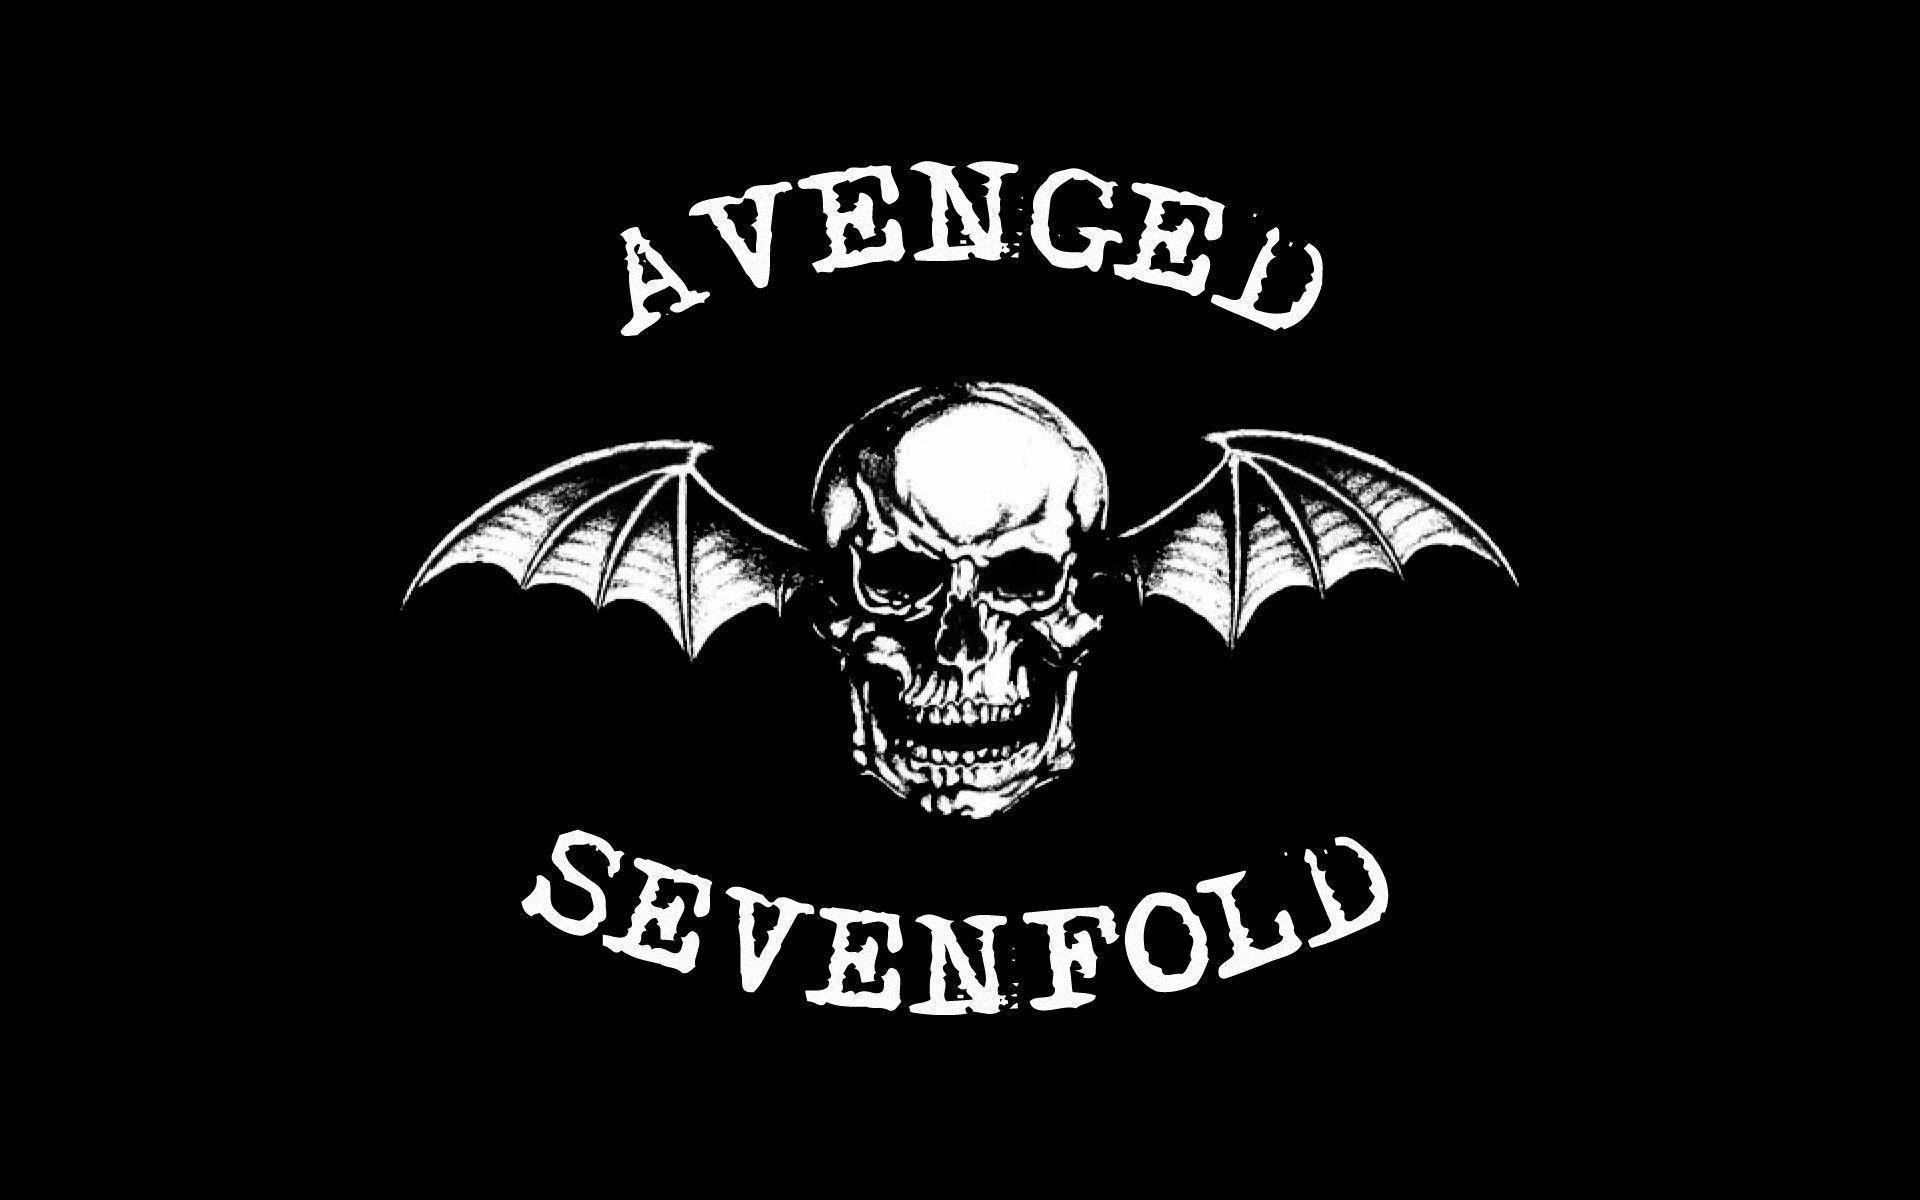 Avenged Sevenfold Deathbat Wallpapers Wallpaper Cave